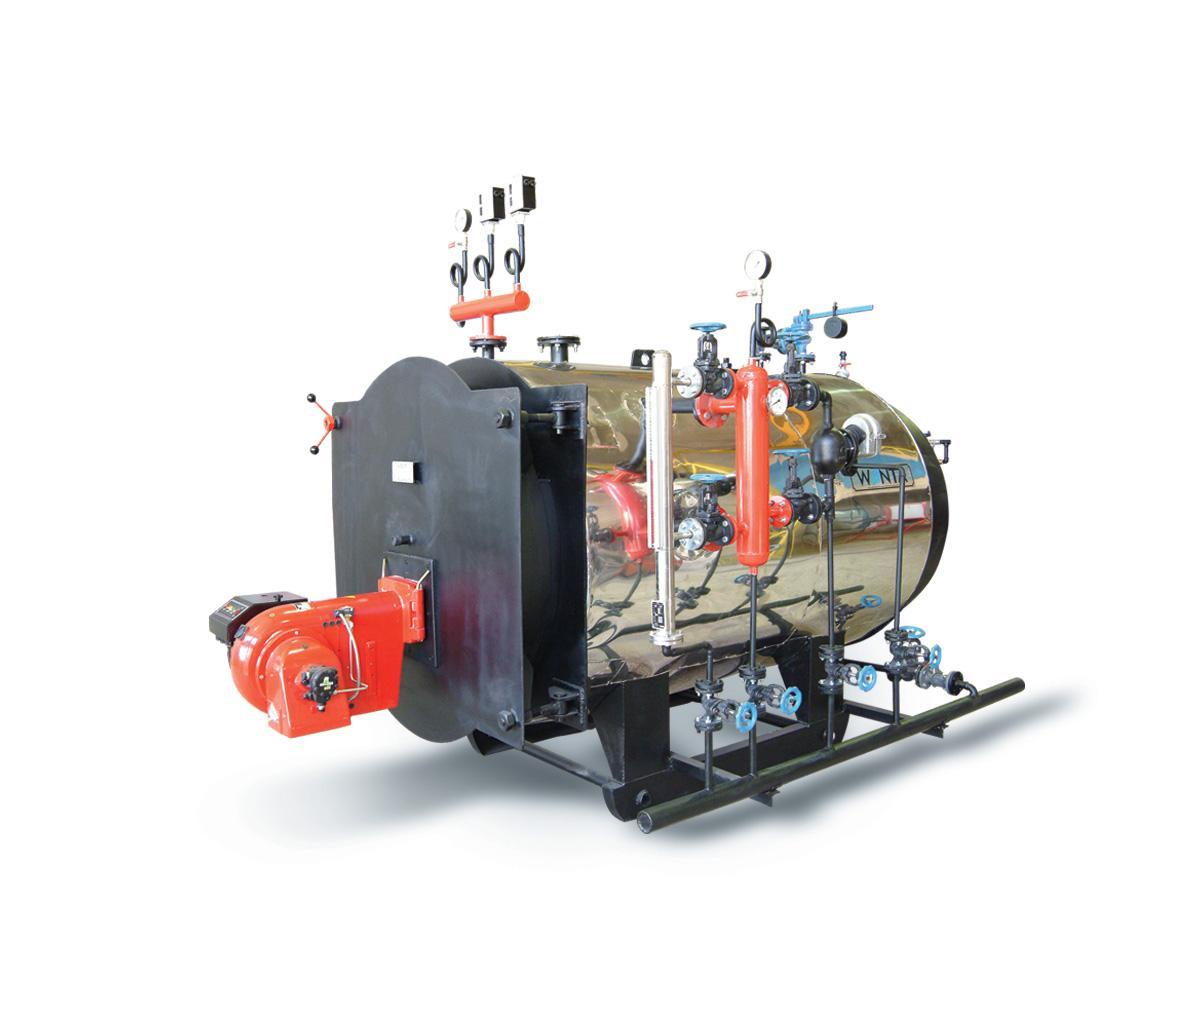 Mechatronic Steam Generator (Мехатроника Парогенератор)